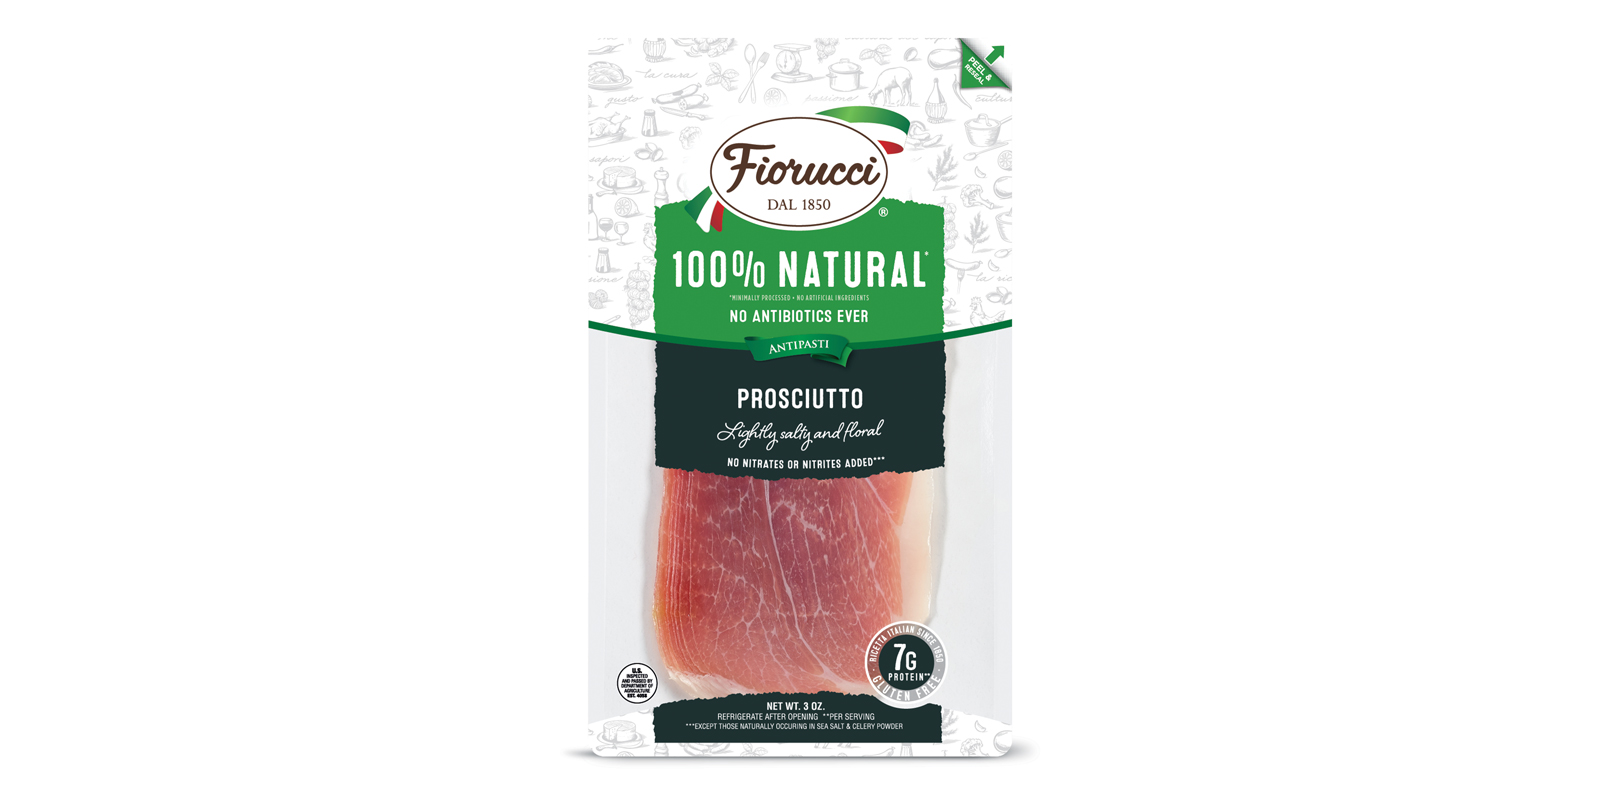 fiorucci-presliced-natural.jpg